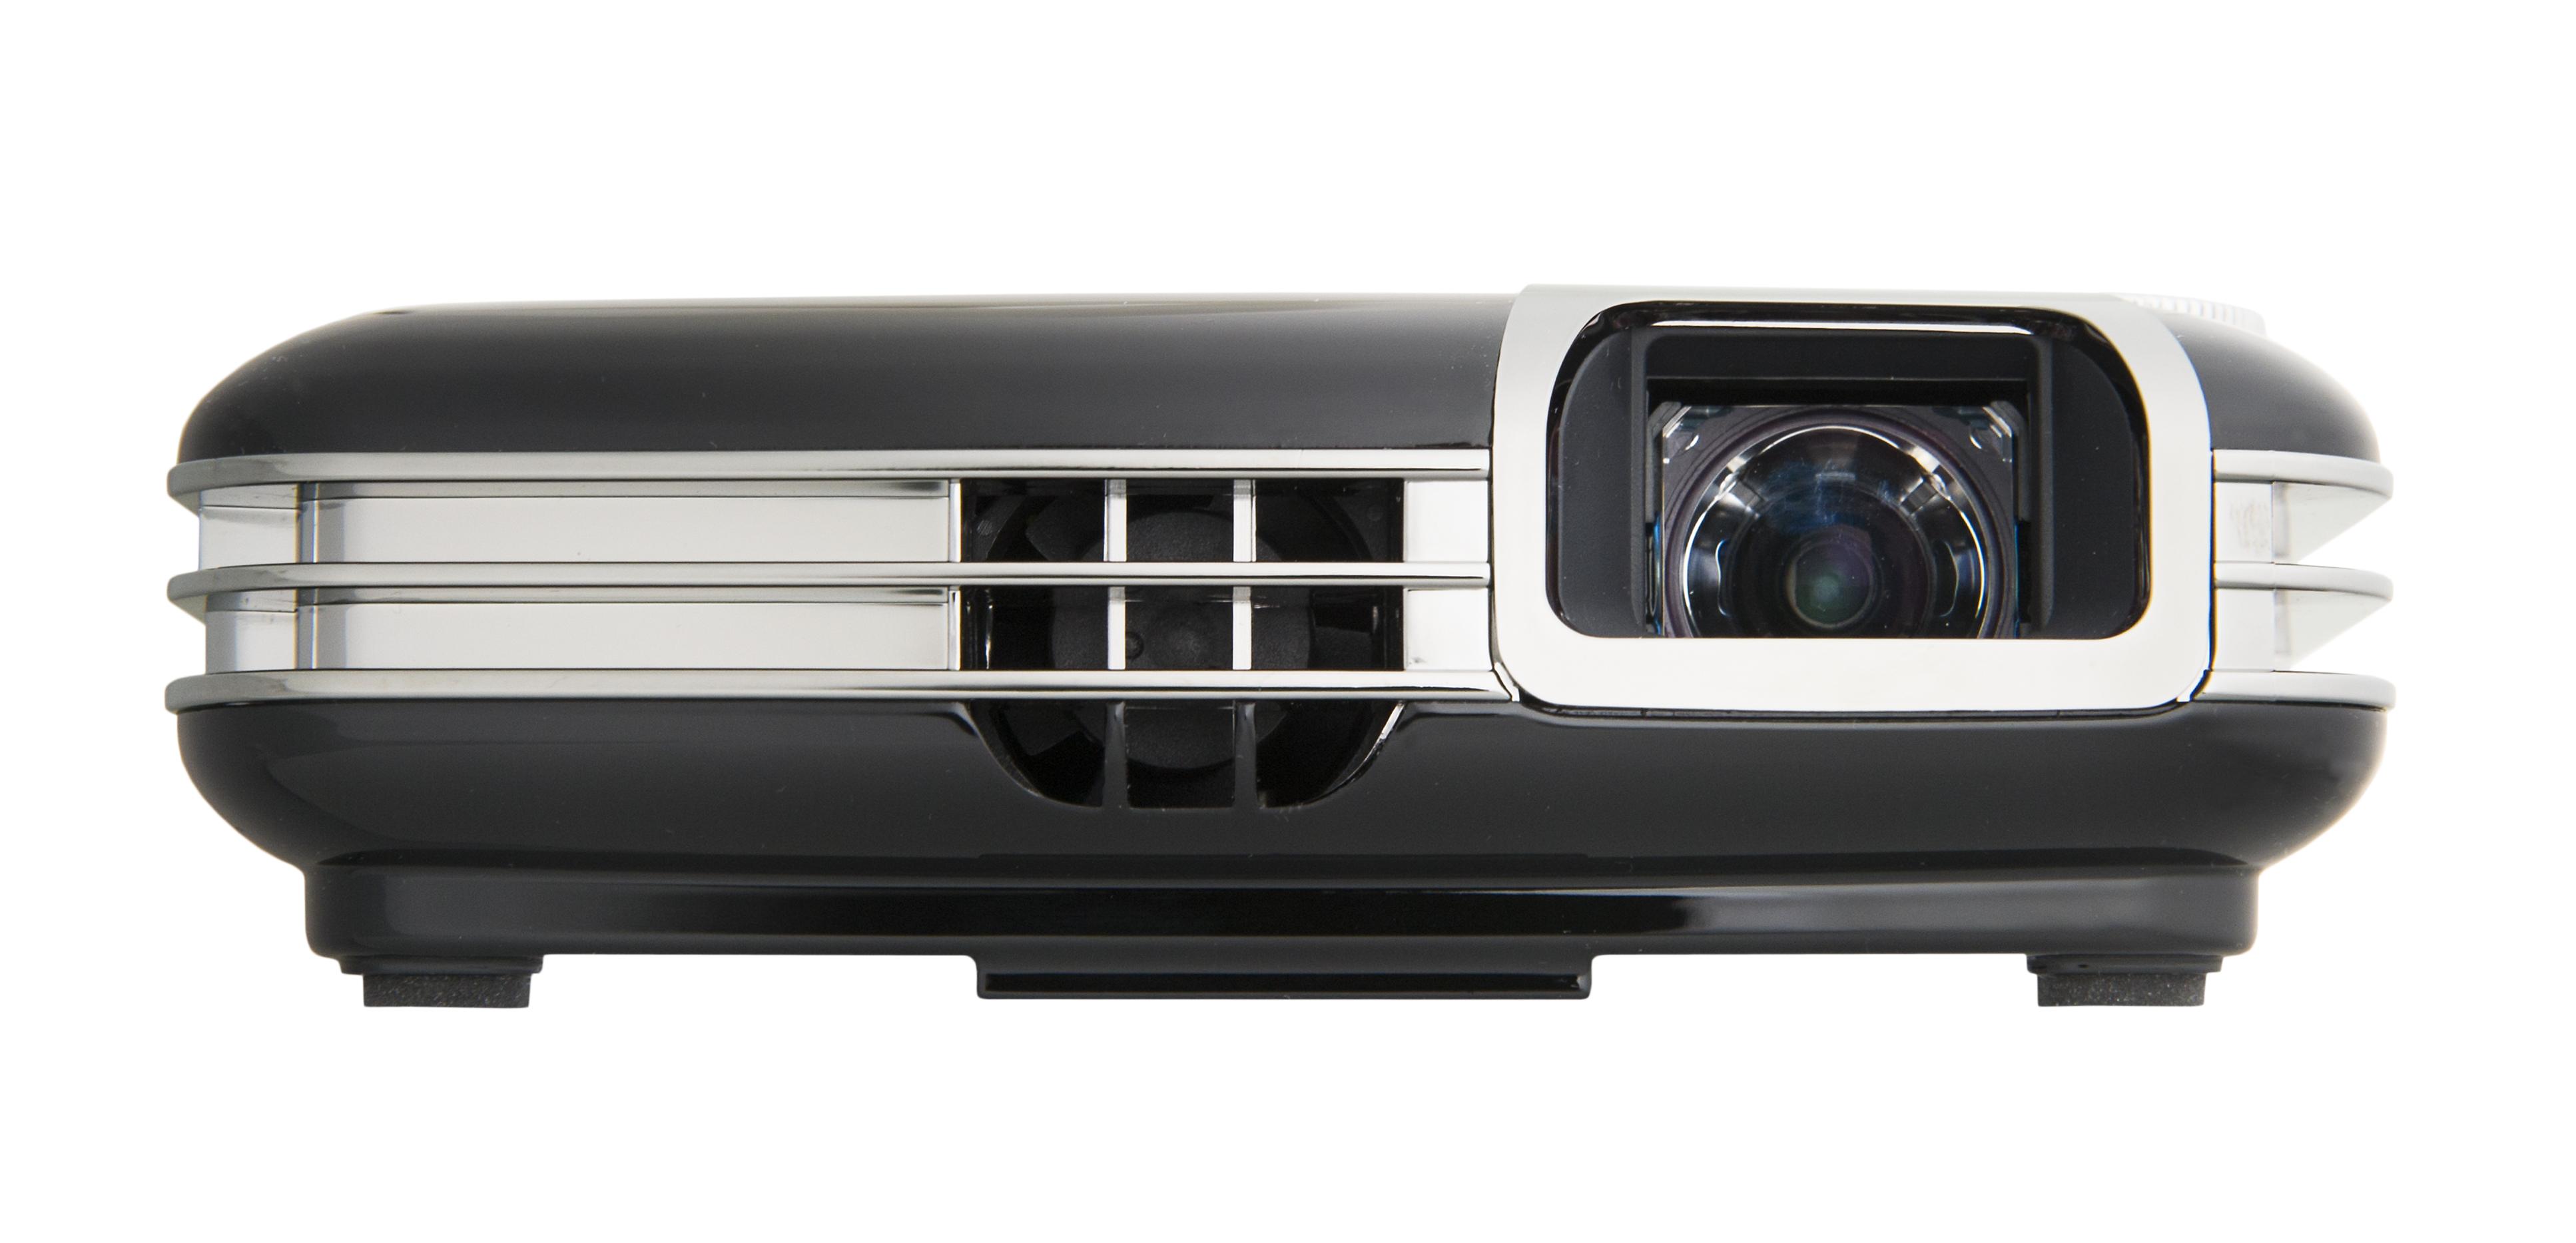 Elmo hook up projector